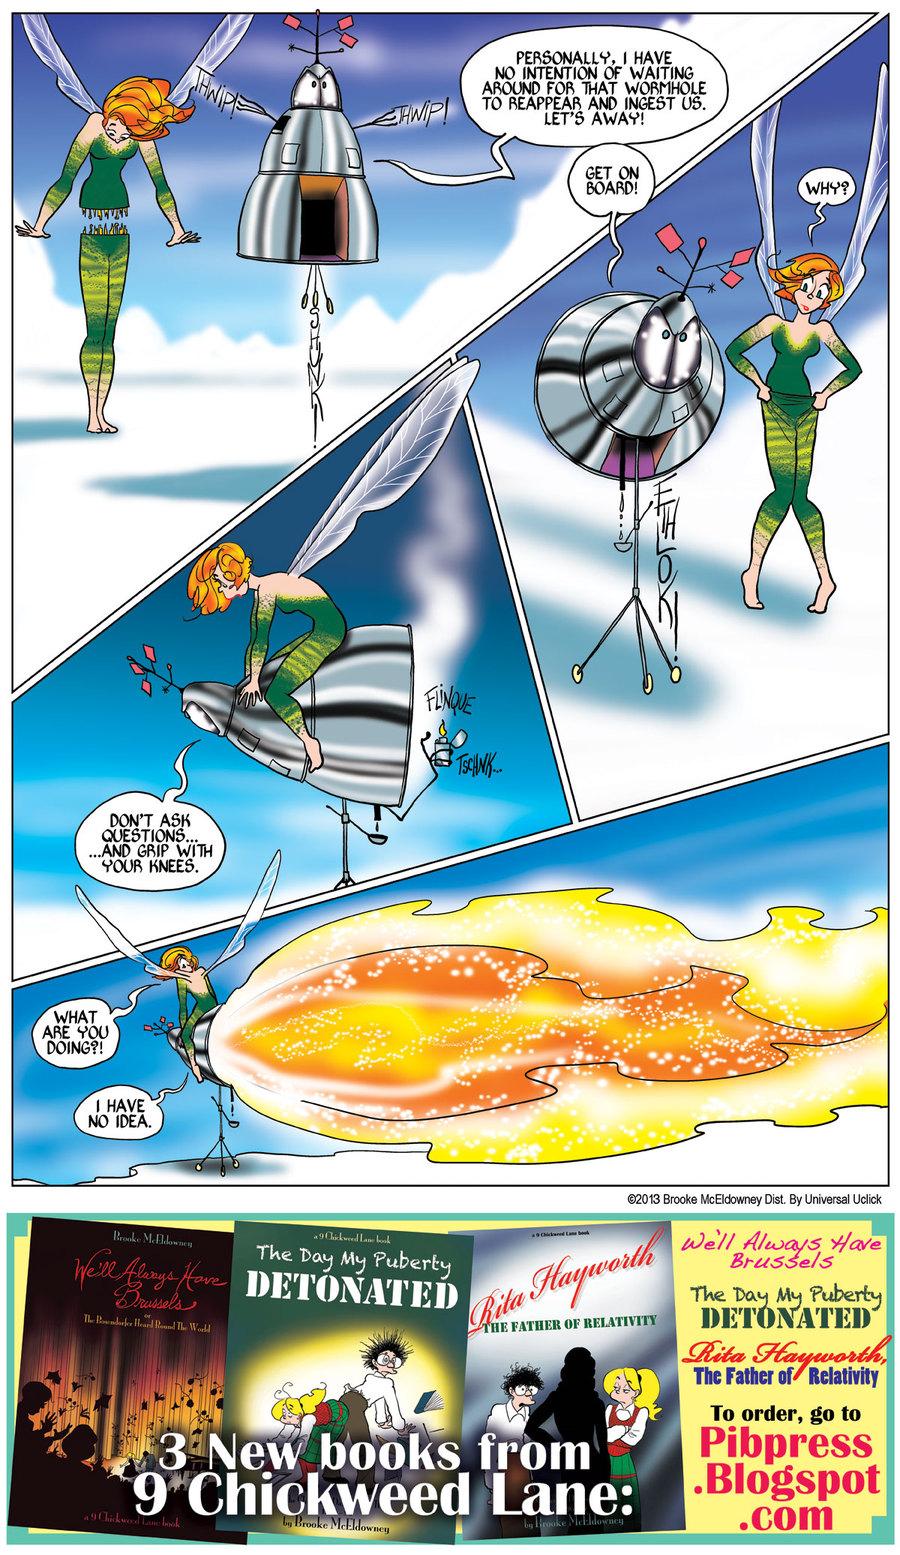 Pibgorn for Apr 10, 2013 Comic Strip